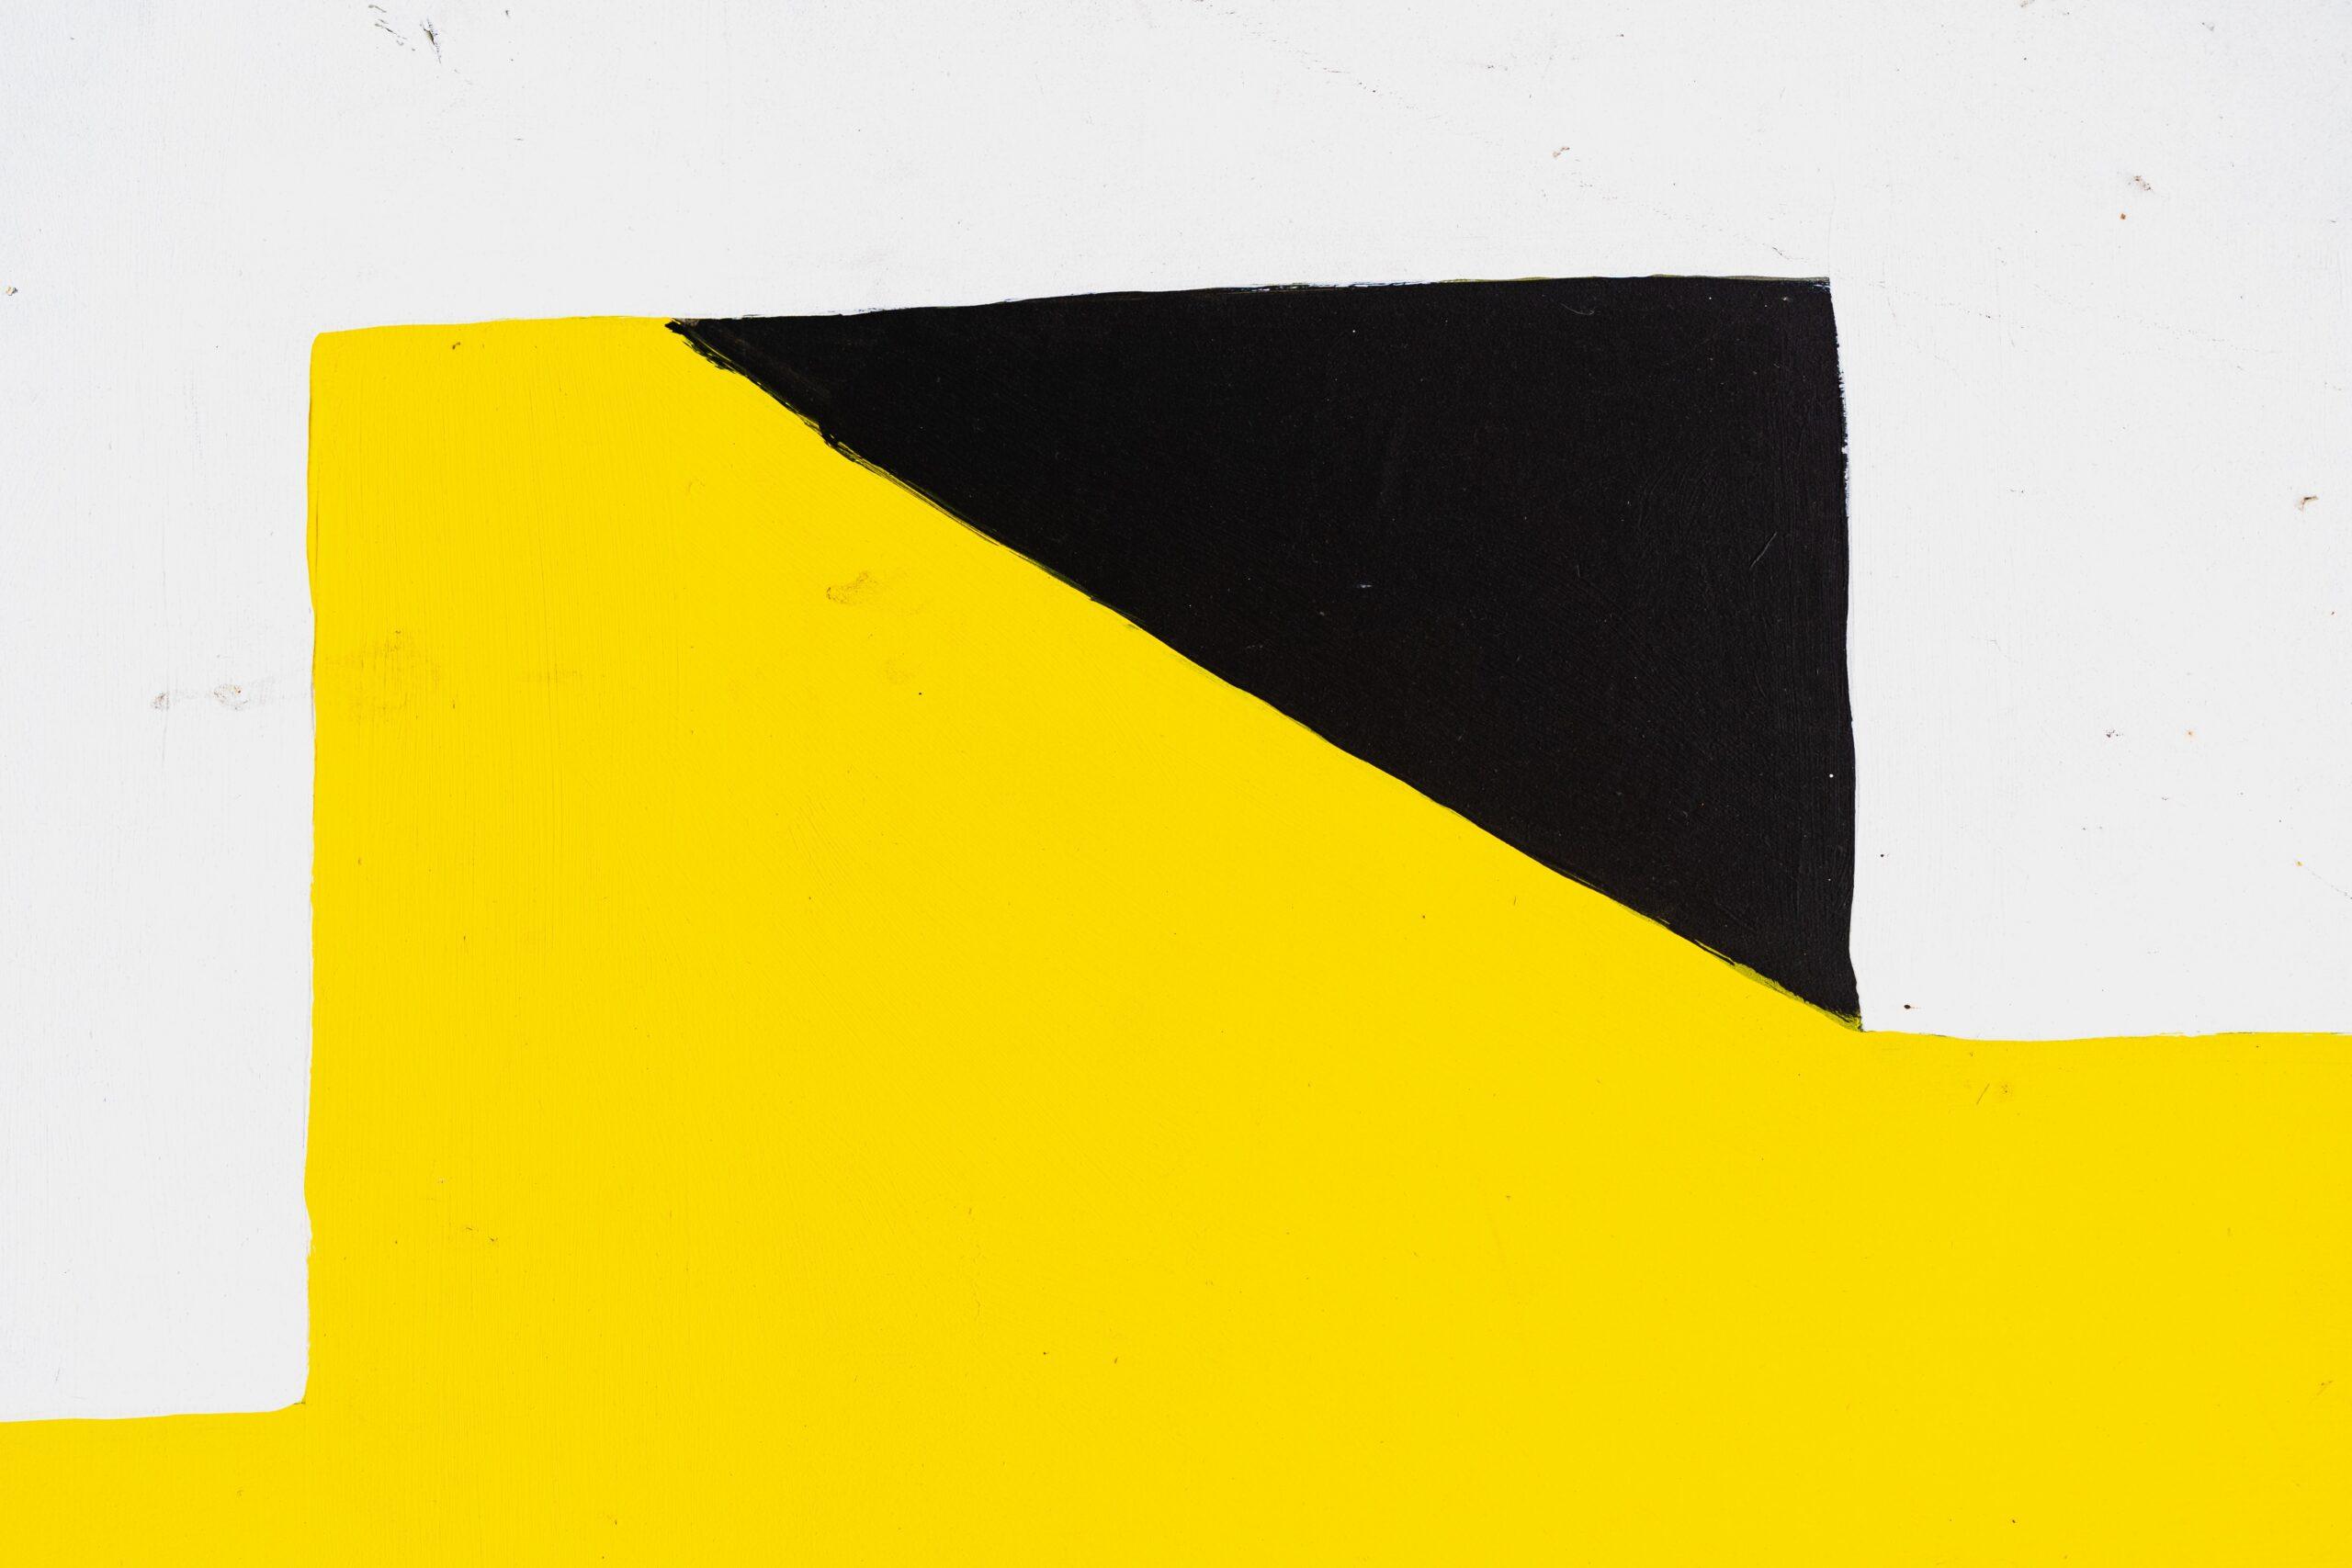 Yellow Black White by Dan Gold - https://unsplash.com/@danielcgold